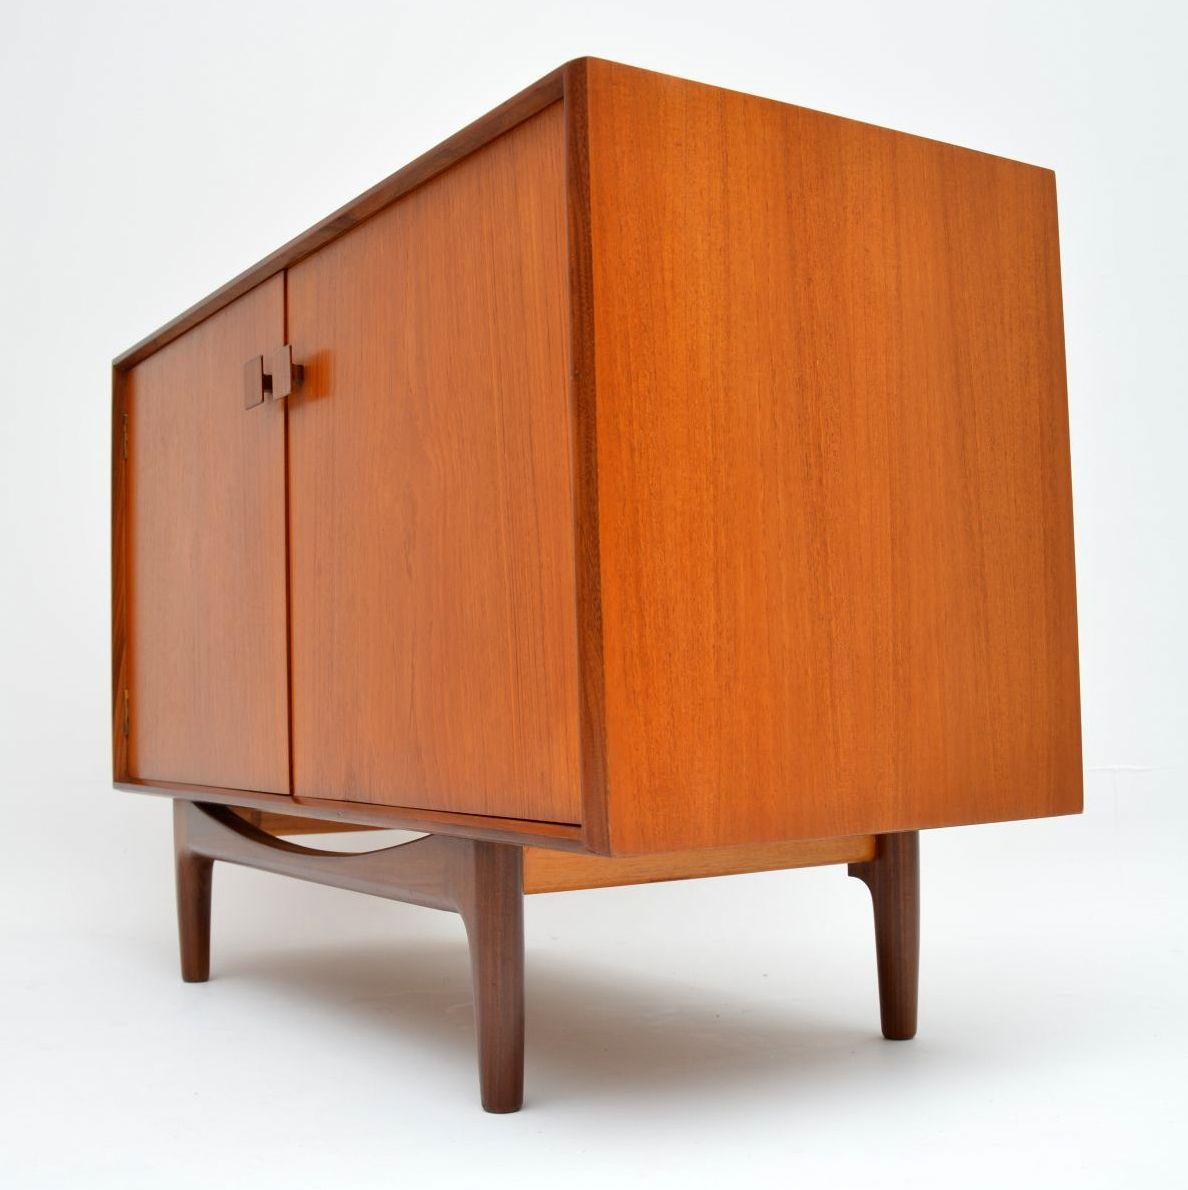 danish_teak_sideboard_cabinet_kofod_larsen_6